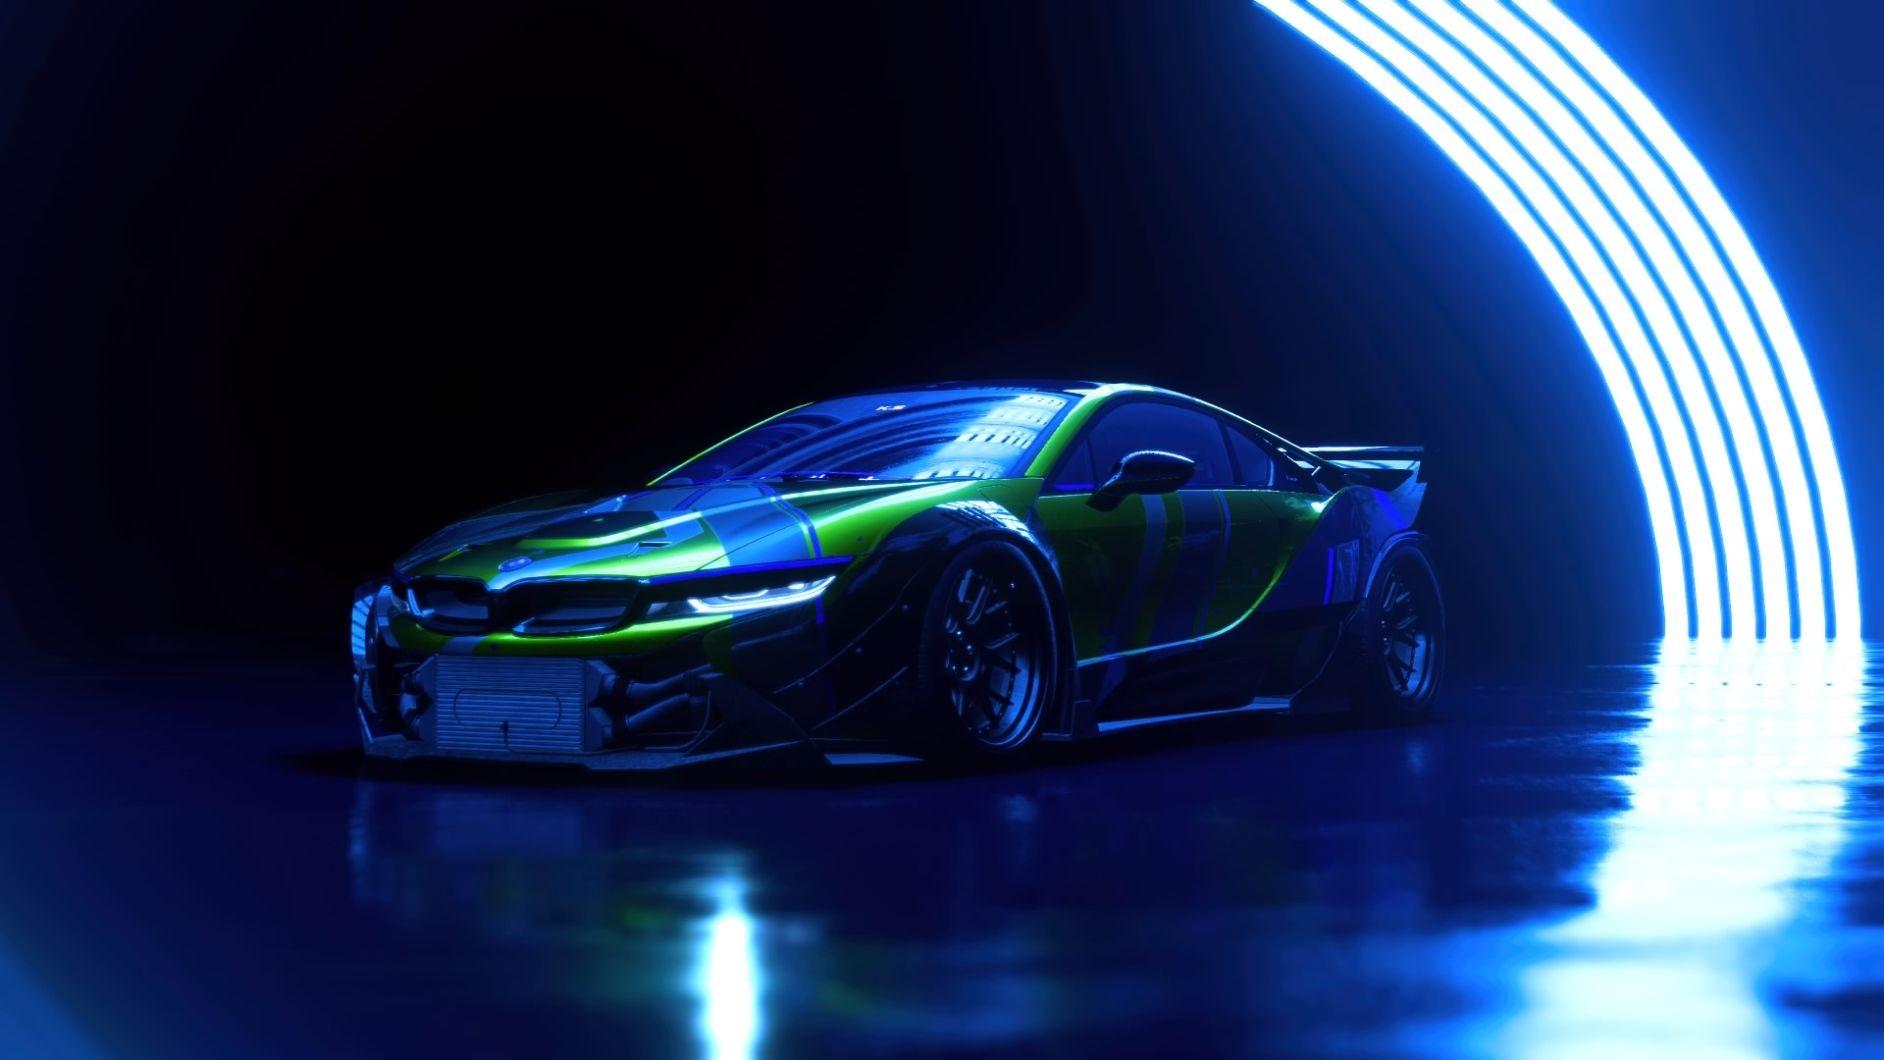 Need for Speed Heat bil i neon